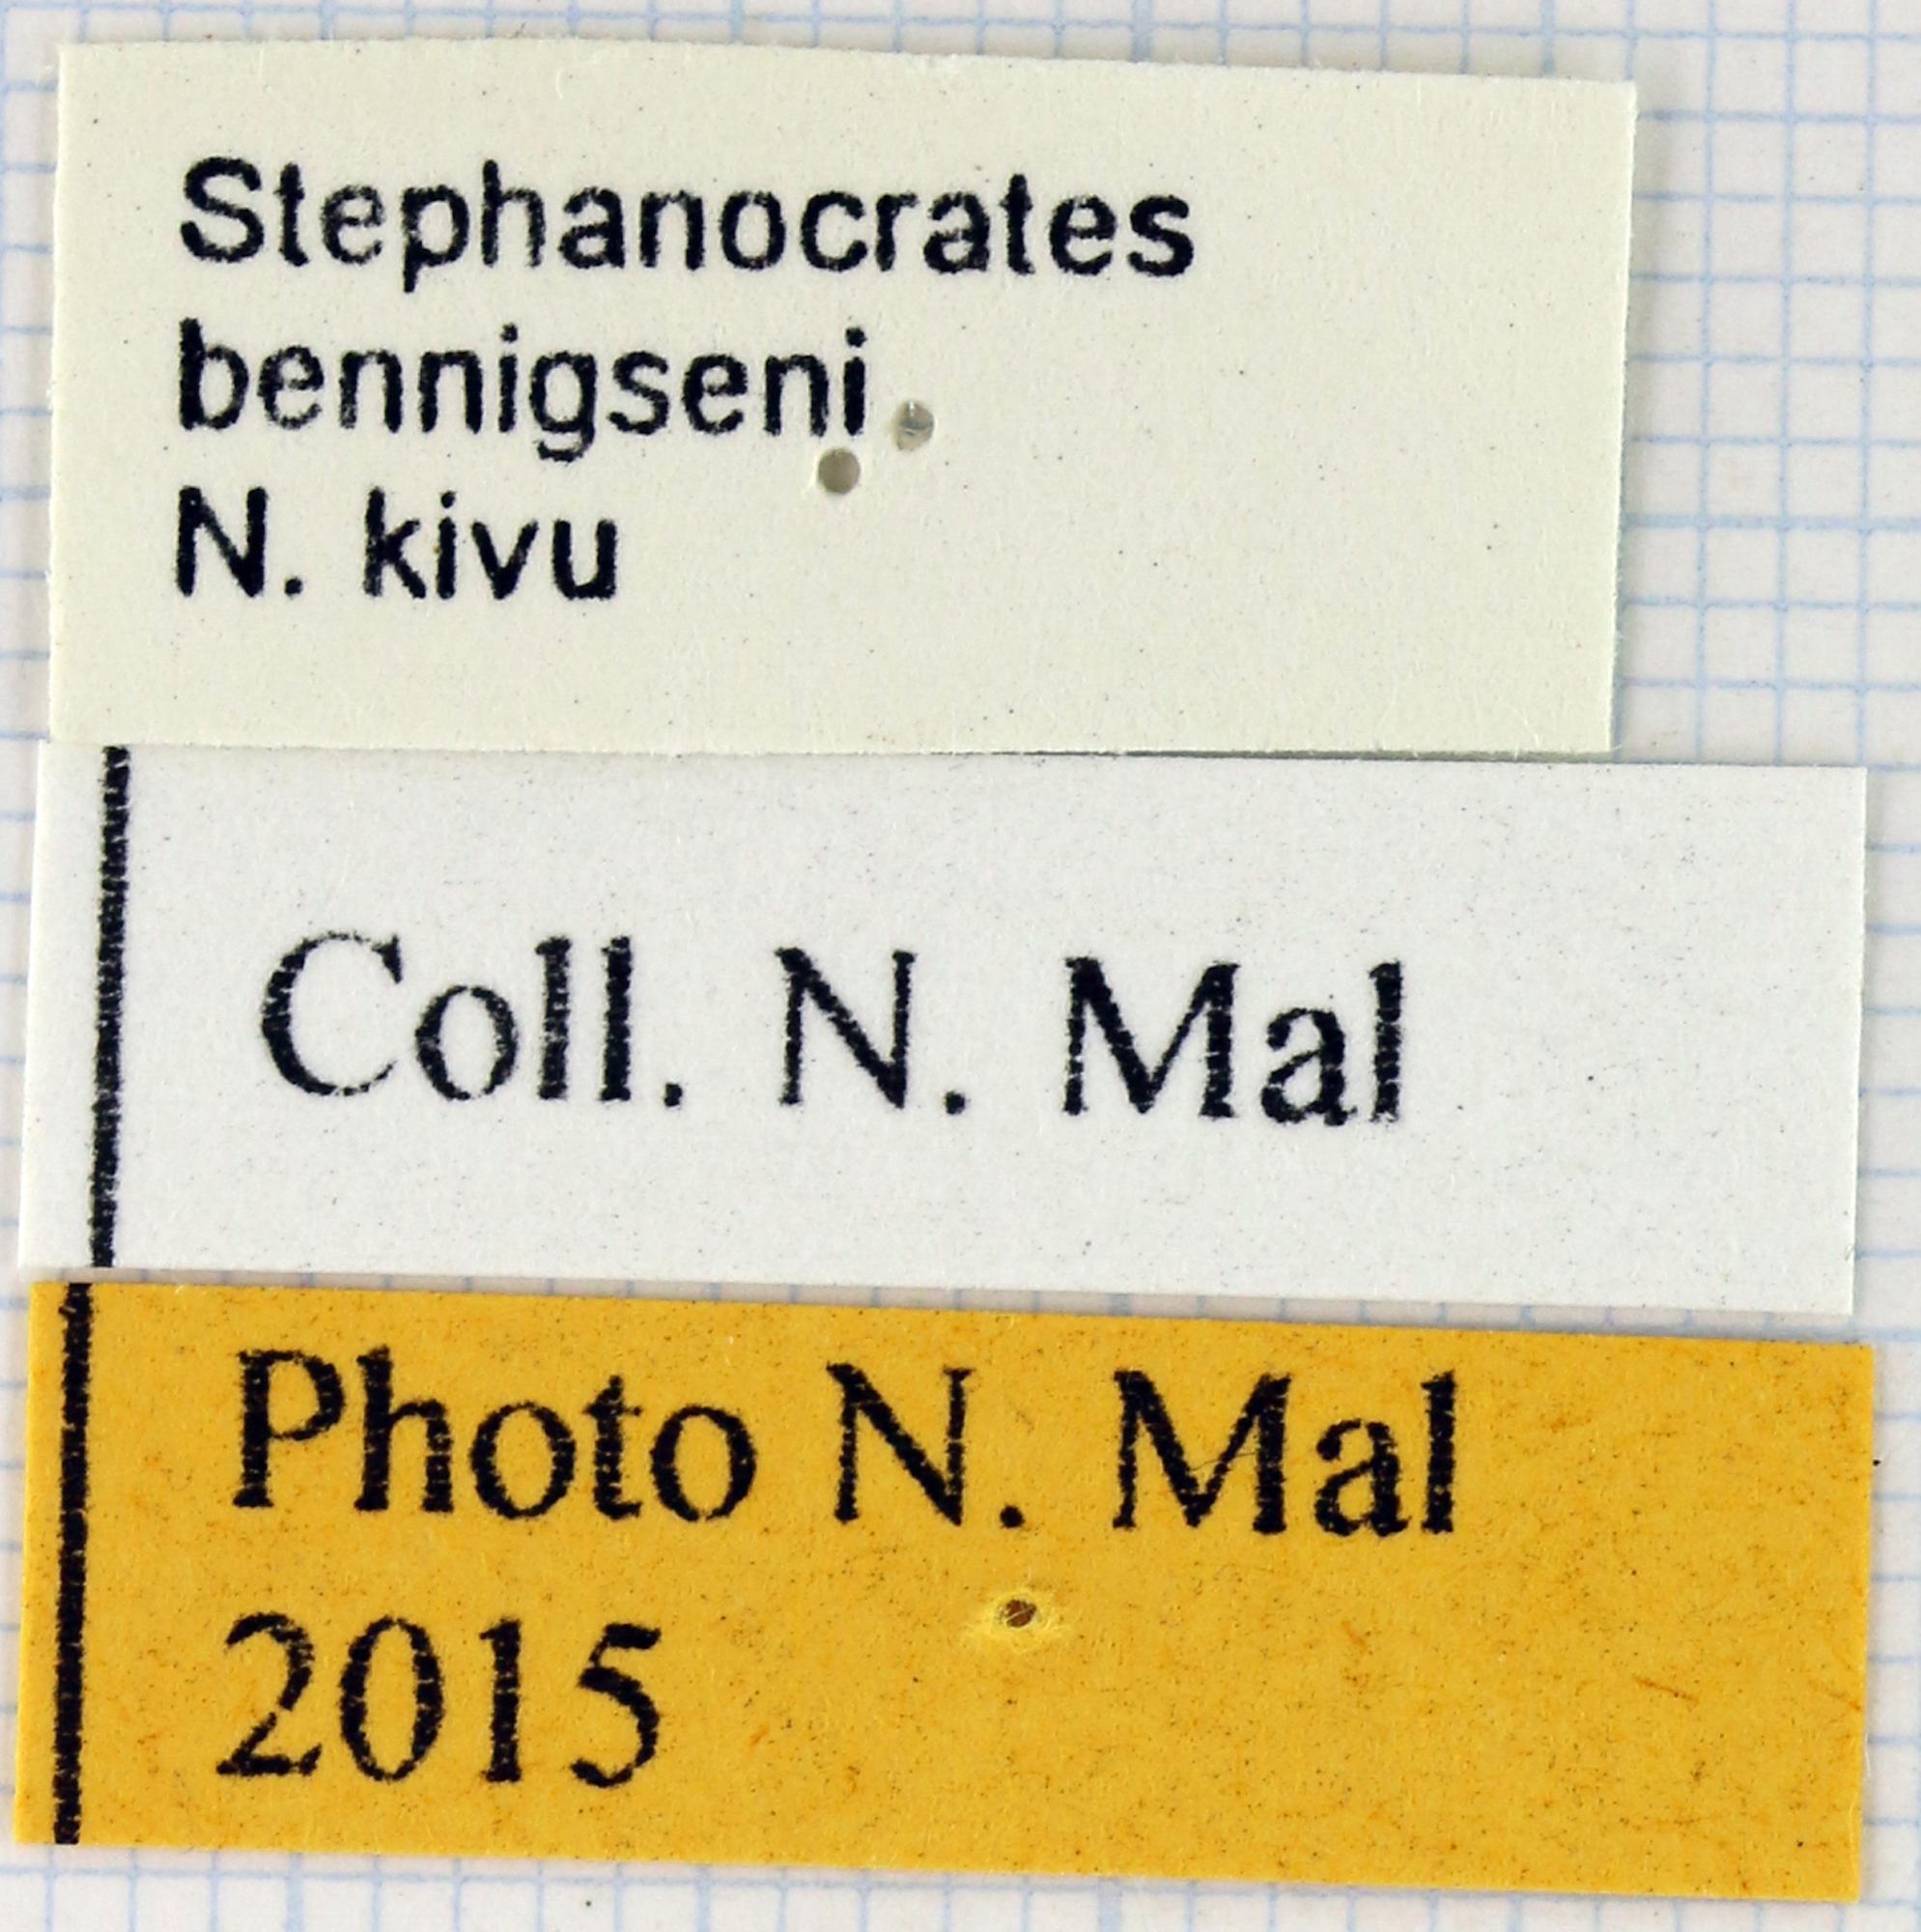 Stephanocrates bennigseni lab.jpg